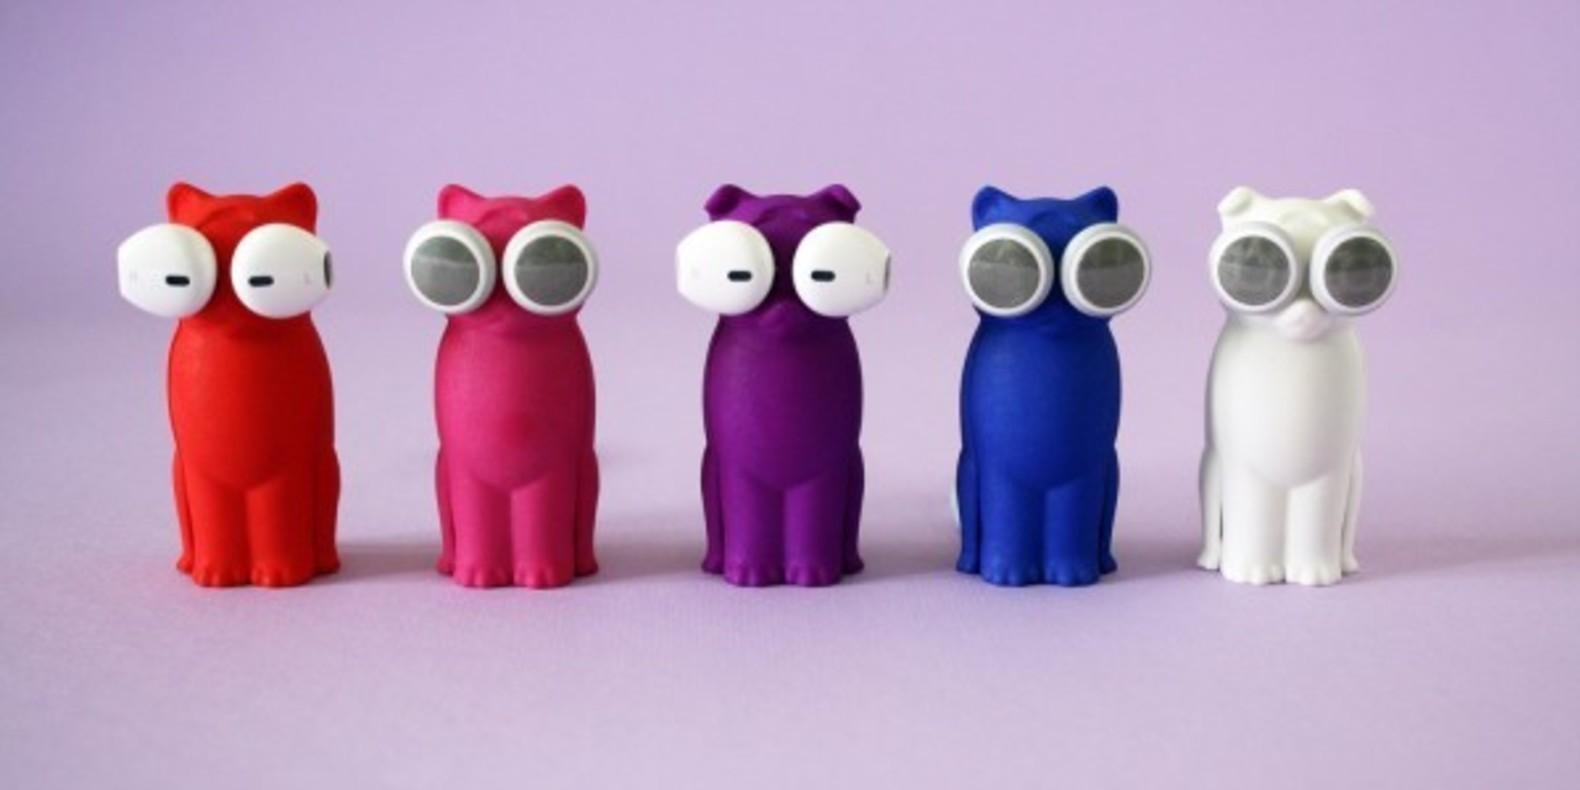 tareq mirza bud-E 3D printed printing kickstarter chien chat écouteurs imprimés en 3D puddy kitty 1